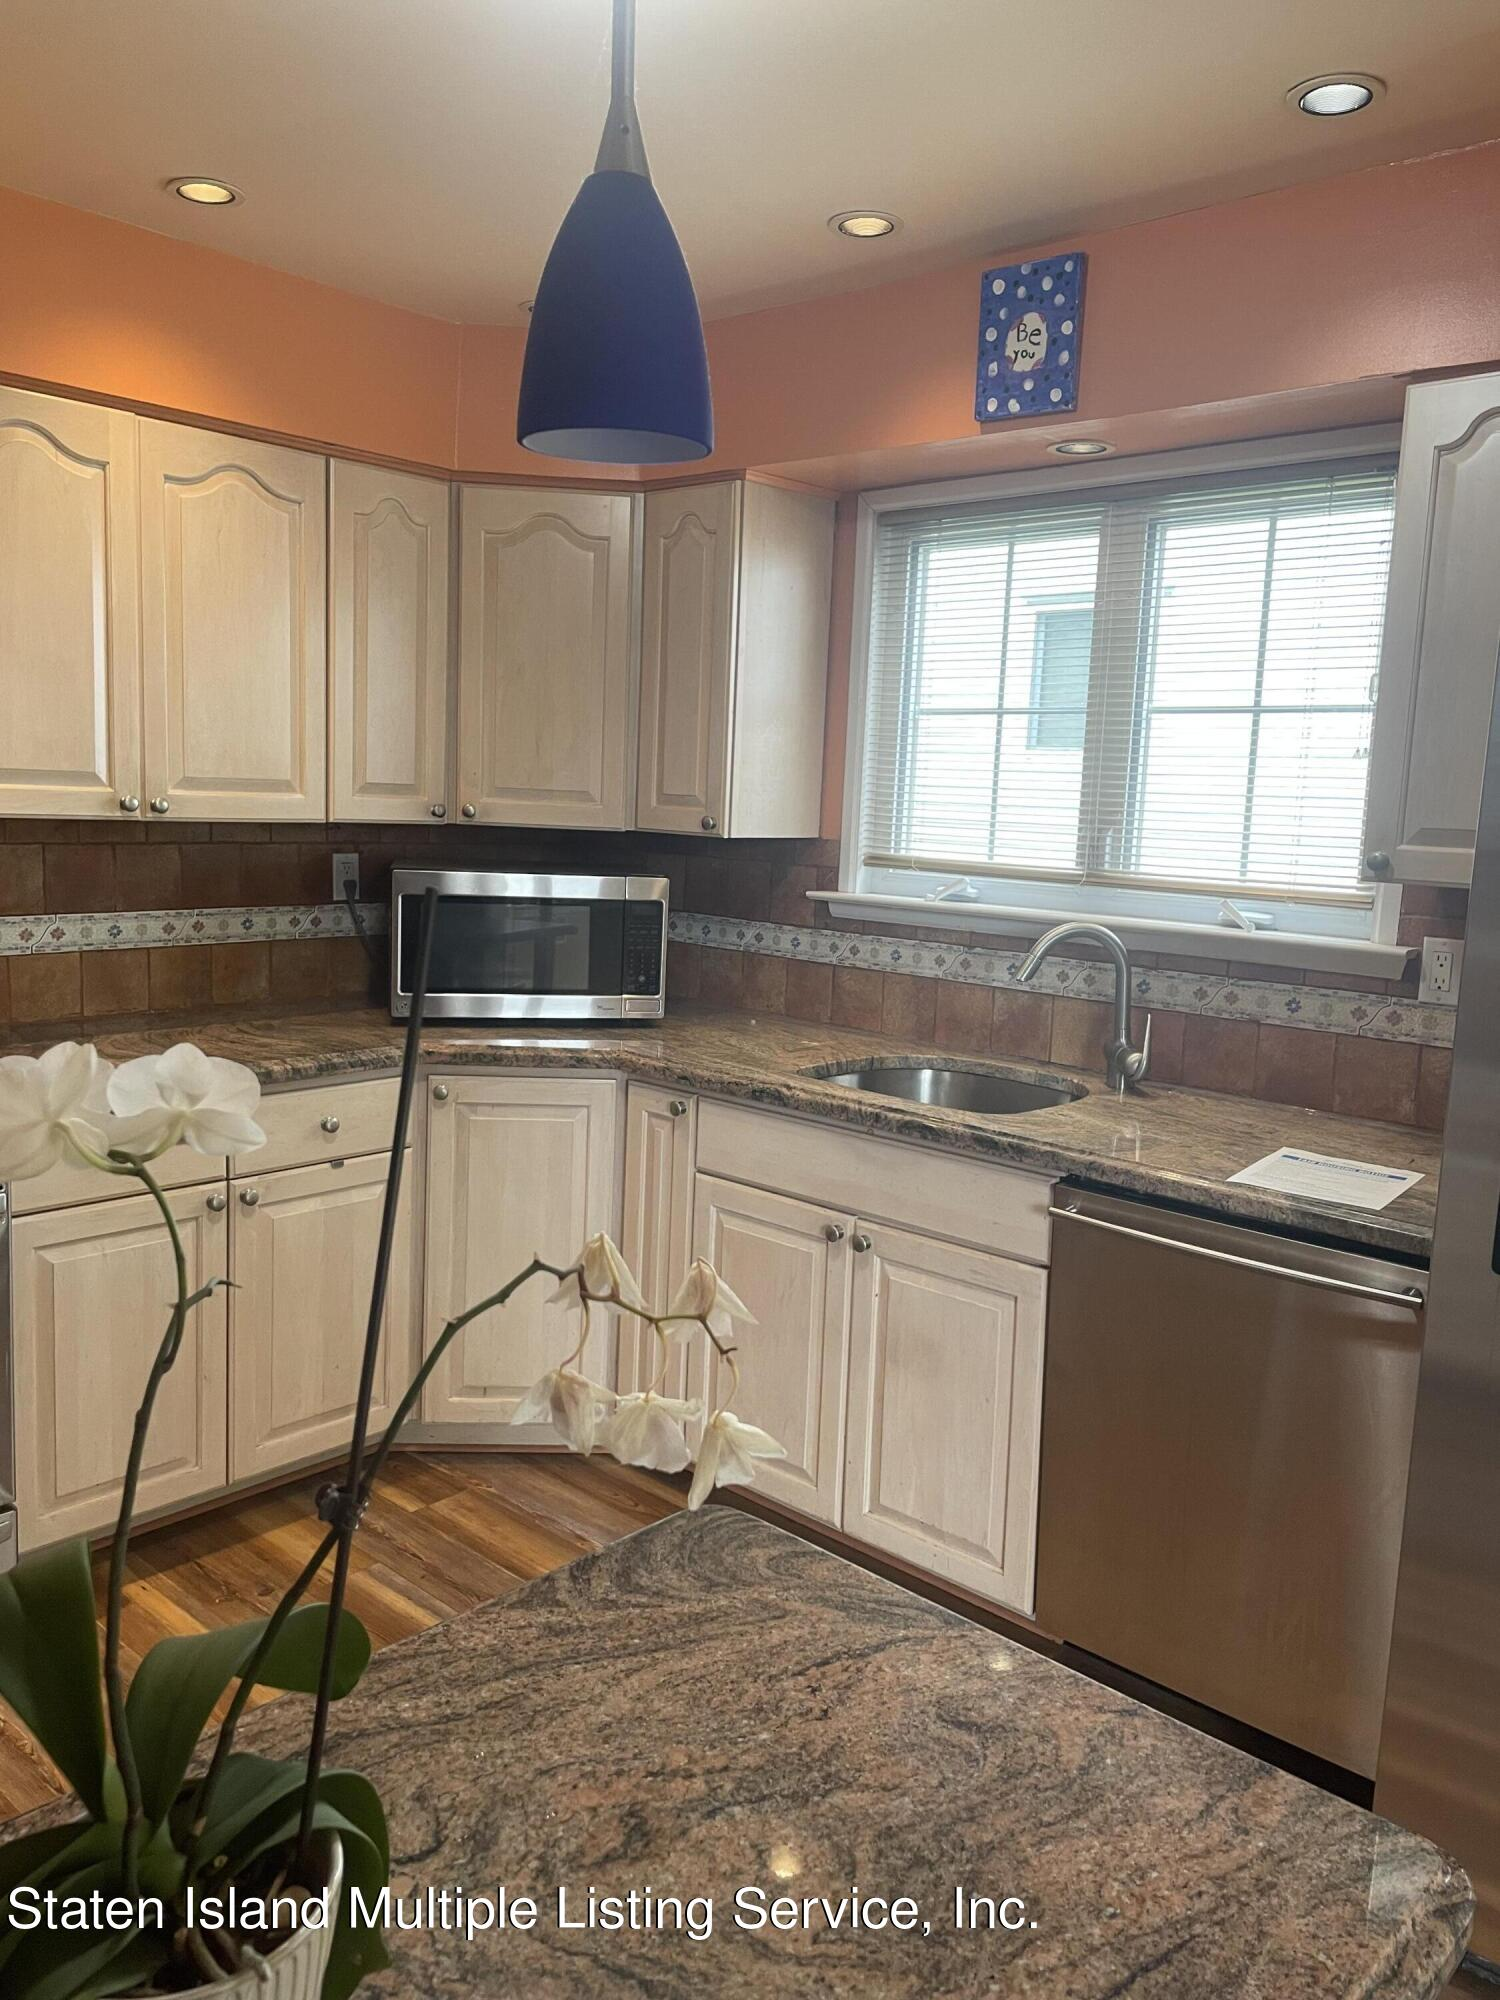 Single Family - Detached 484 Mountainview Avenue  Staten Island, NY 10314, MLS-1147175-52